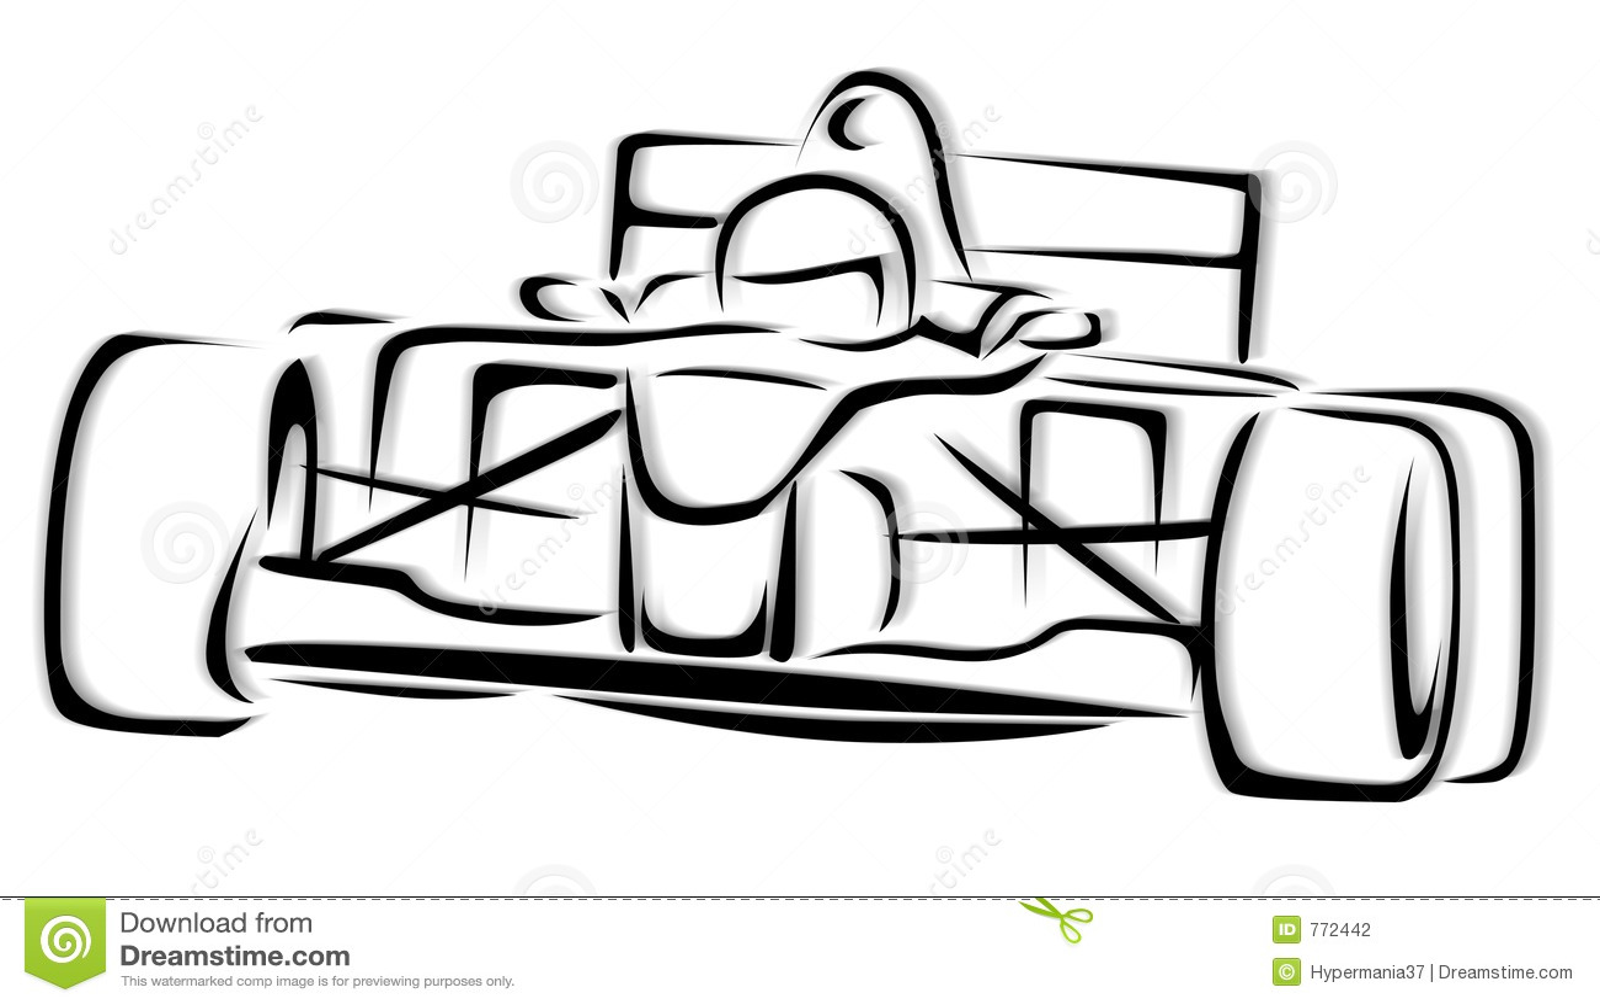 F1 Racing Car Illustration Stock Illustration